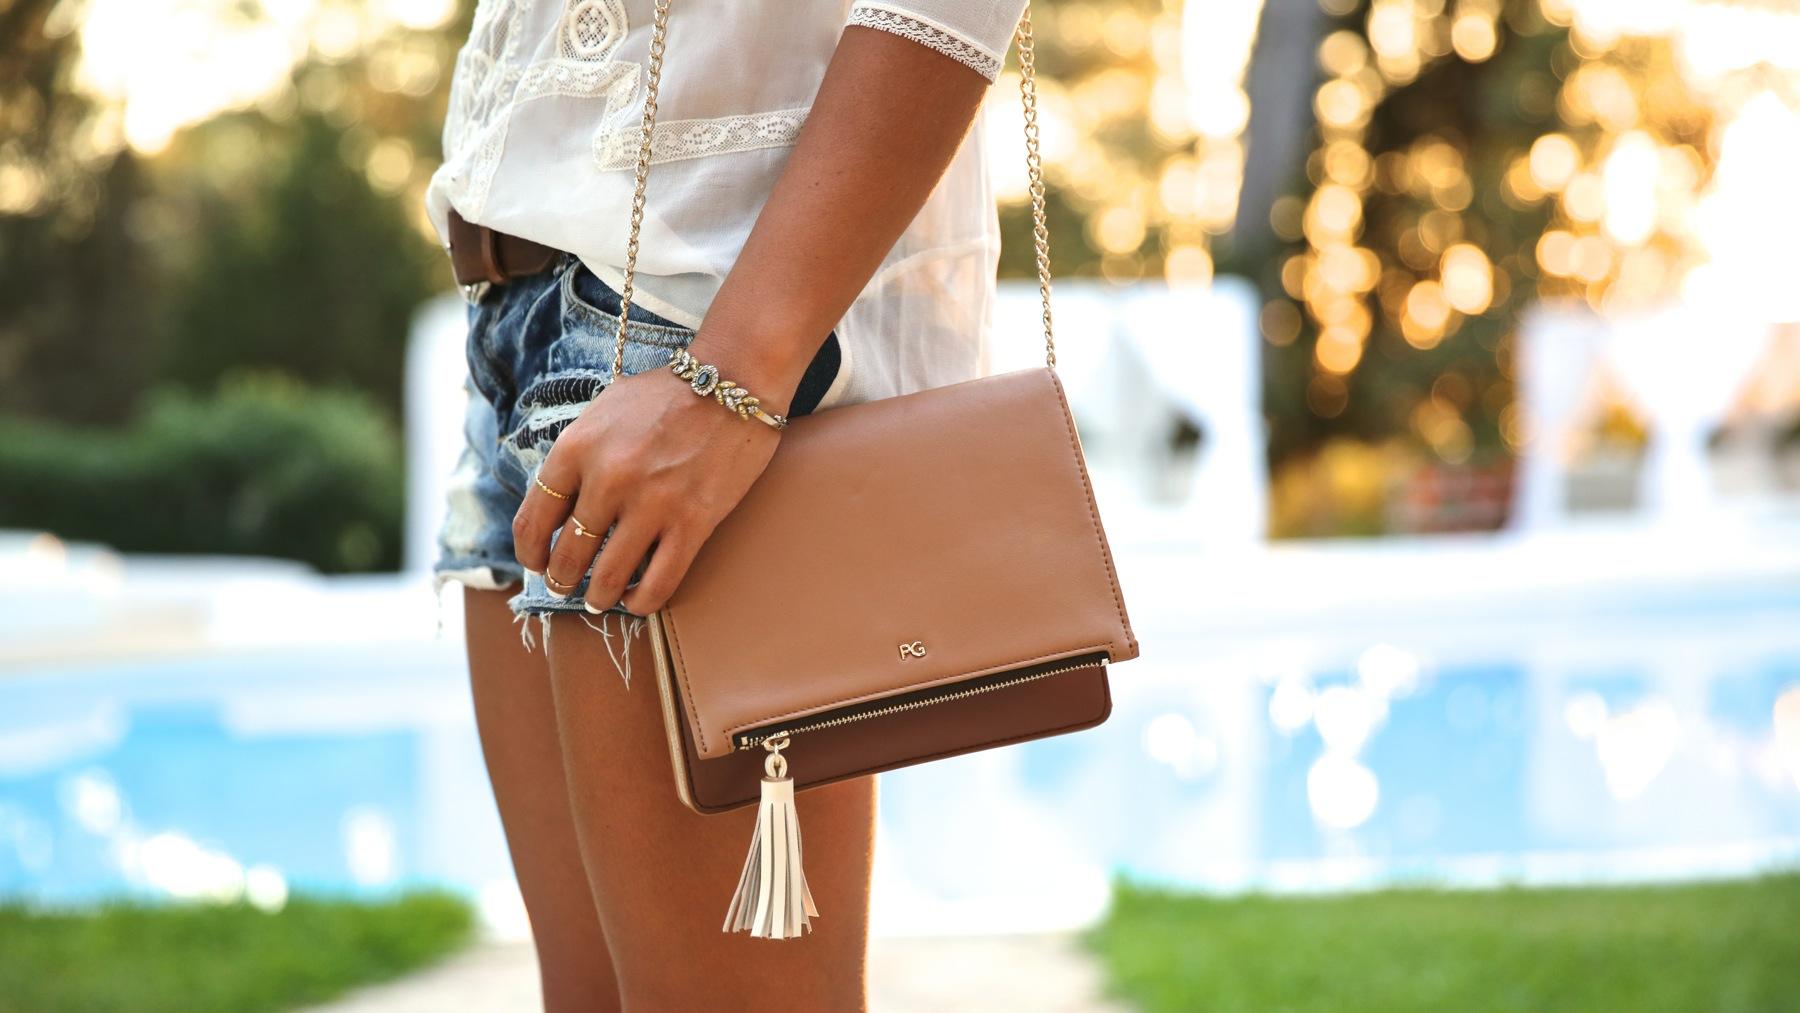 trendy_taste-look-outfit-street_style-ootd-blog-blogger-fashion_spain-moda_españa-boho-hippie-denim_shorts-shorts_vaqueros-blusa-blouse-mas34-pg-ibiza-sa_talaia-4